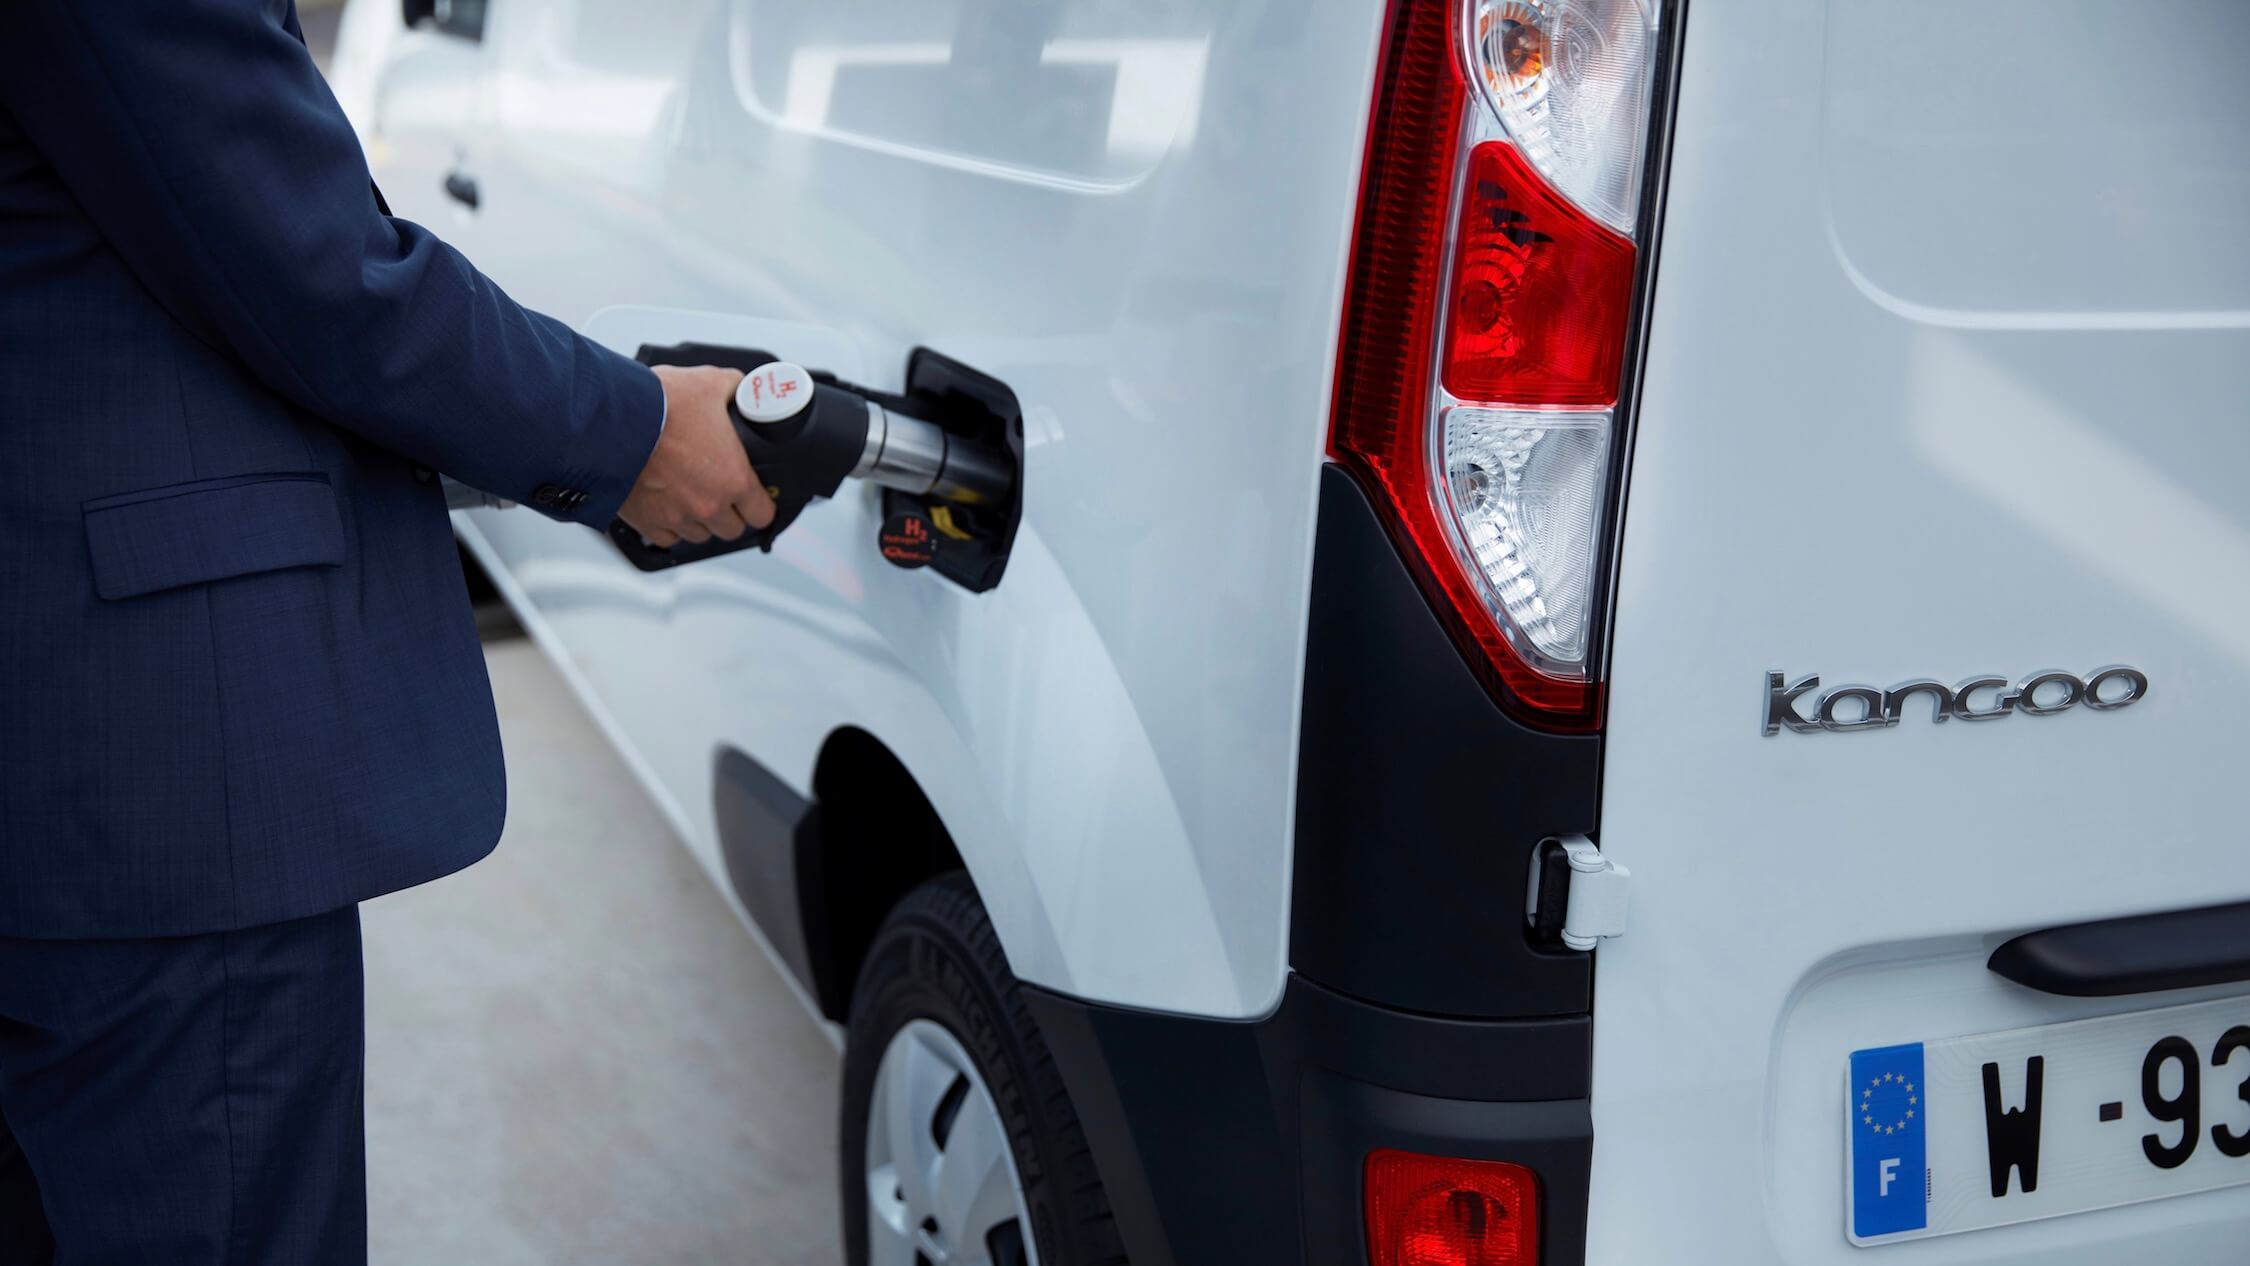 Renault Kangoo waterstof tanken